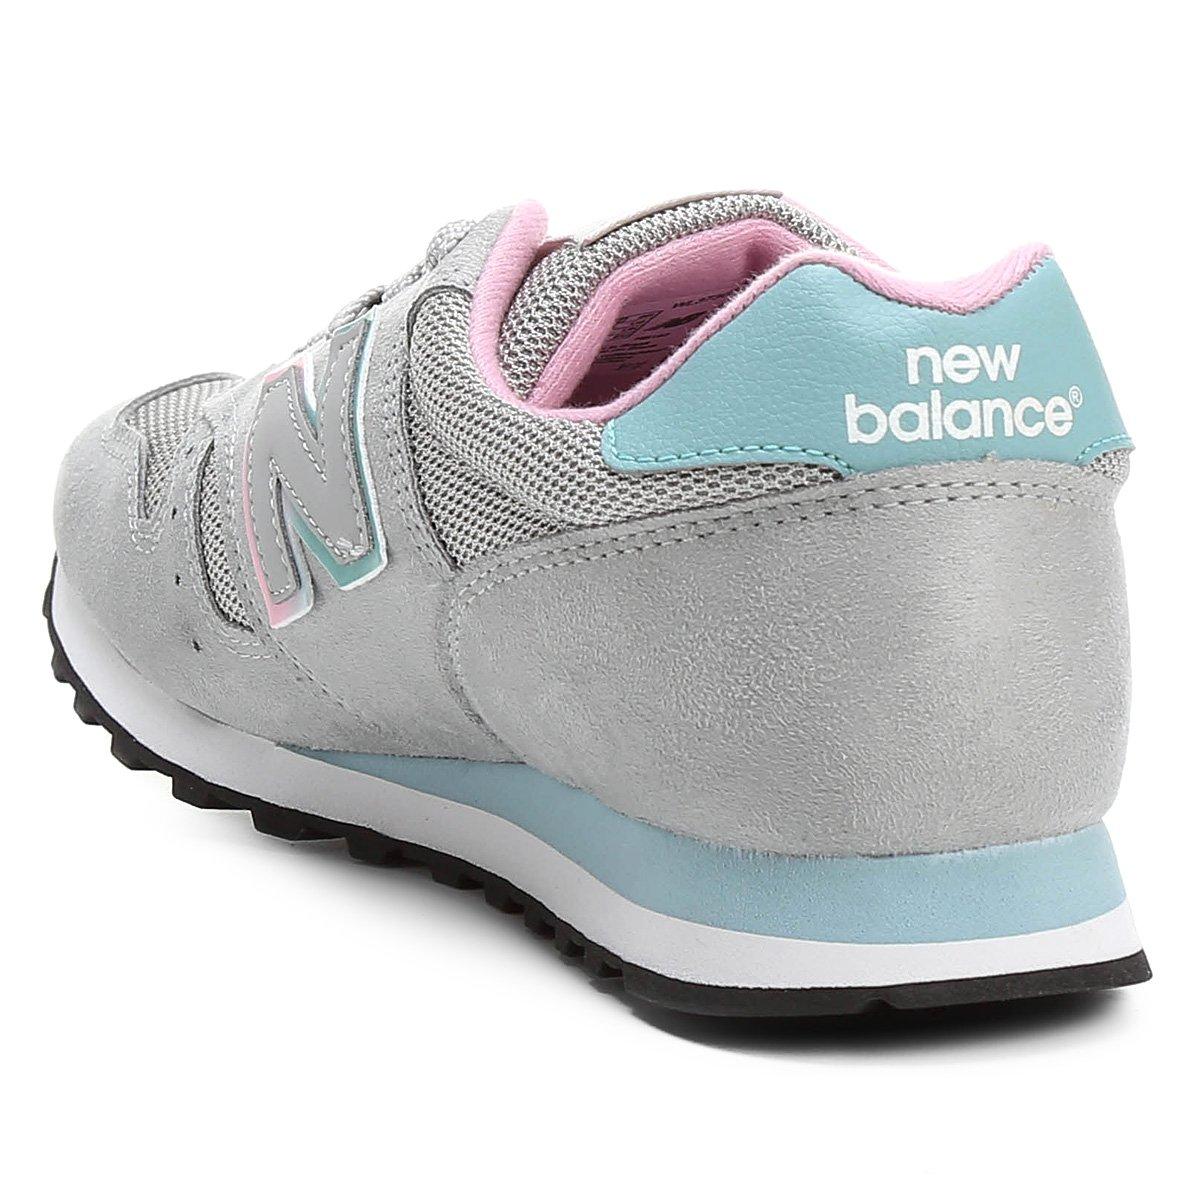 new balance 574 cinza e rosa